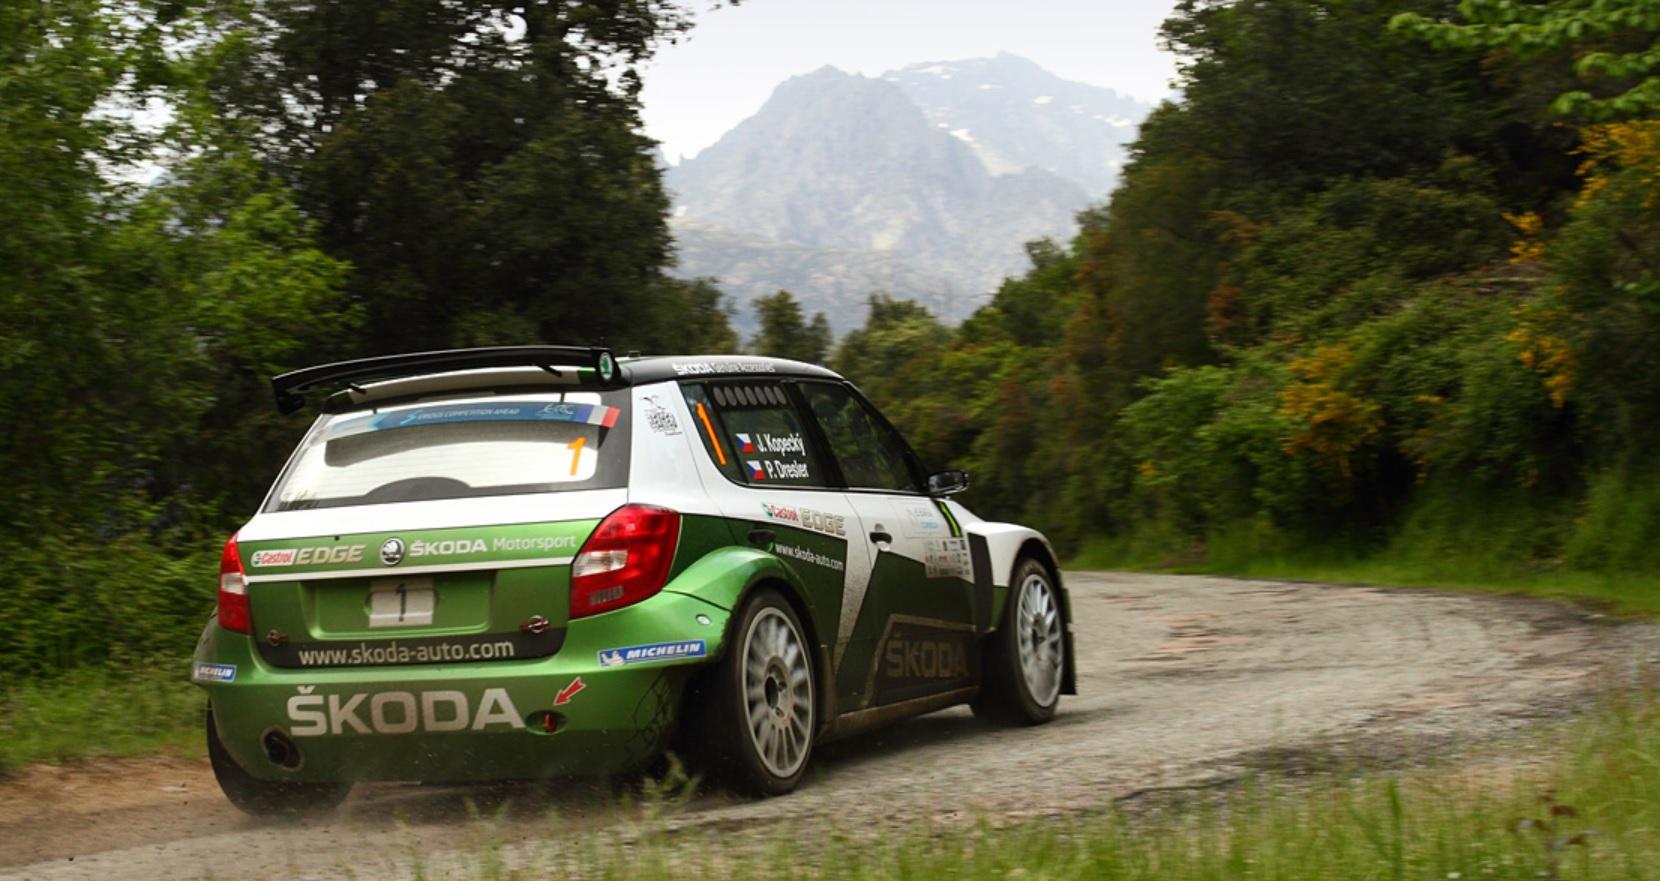 Kopecki-Dresler . Photo Rallye-Mania-cz